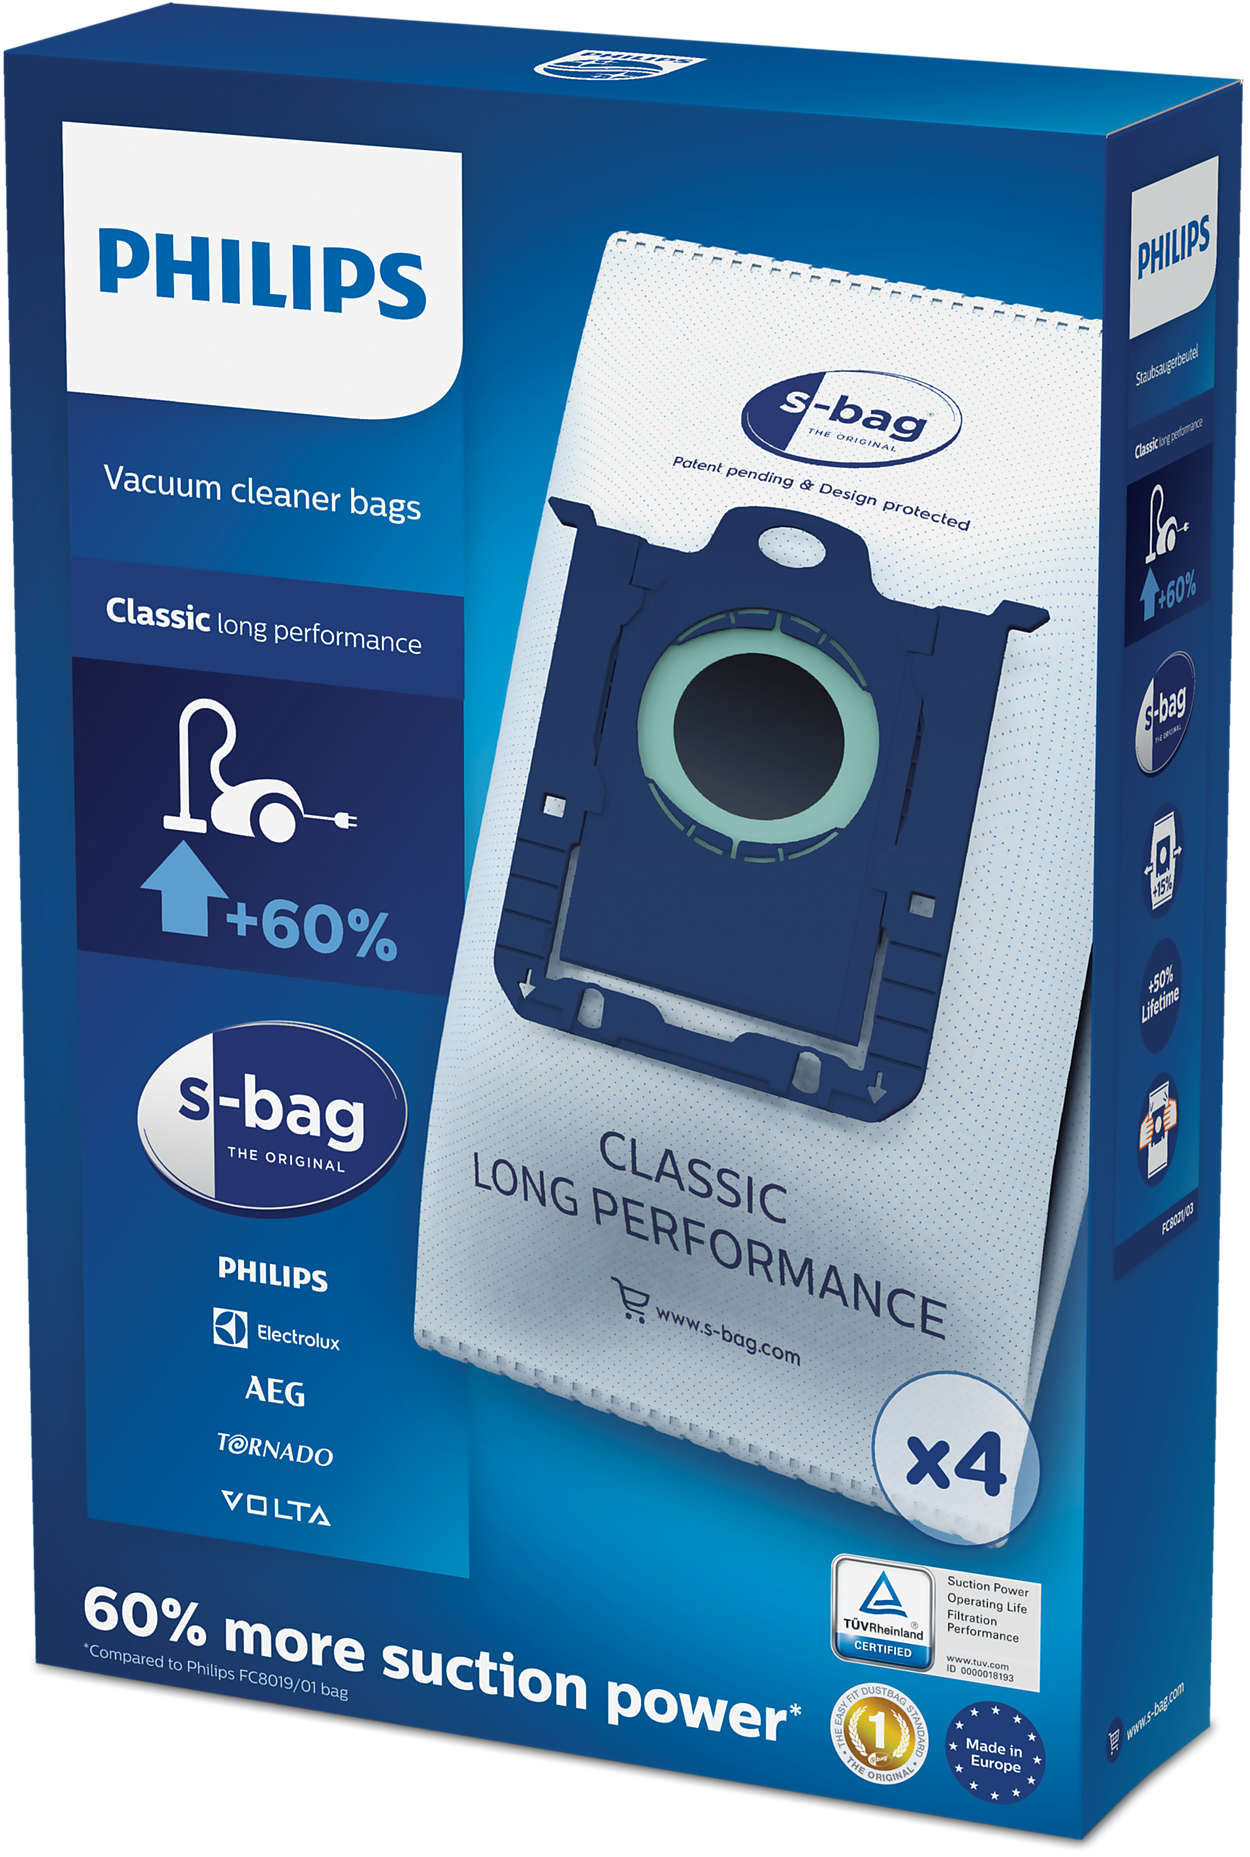 S Bag Vacuum Cleaner Bags Fc8021 03 Philips